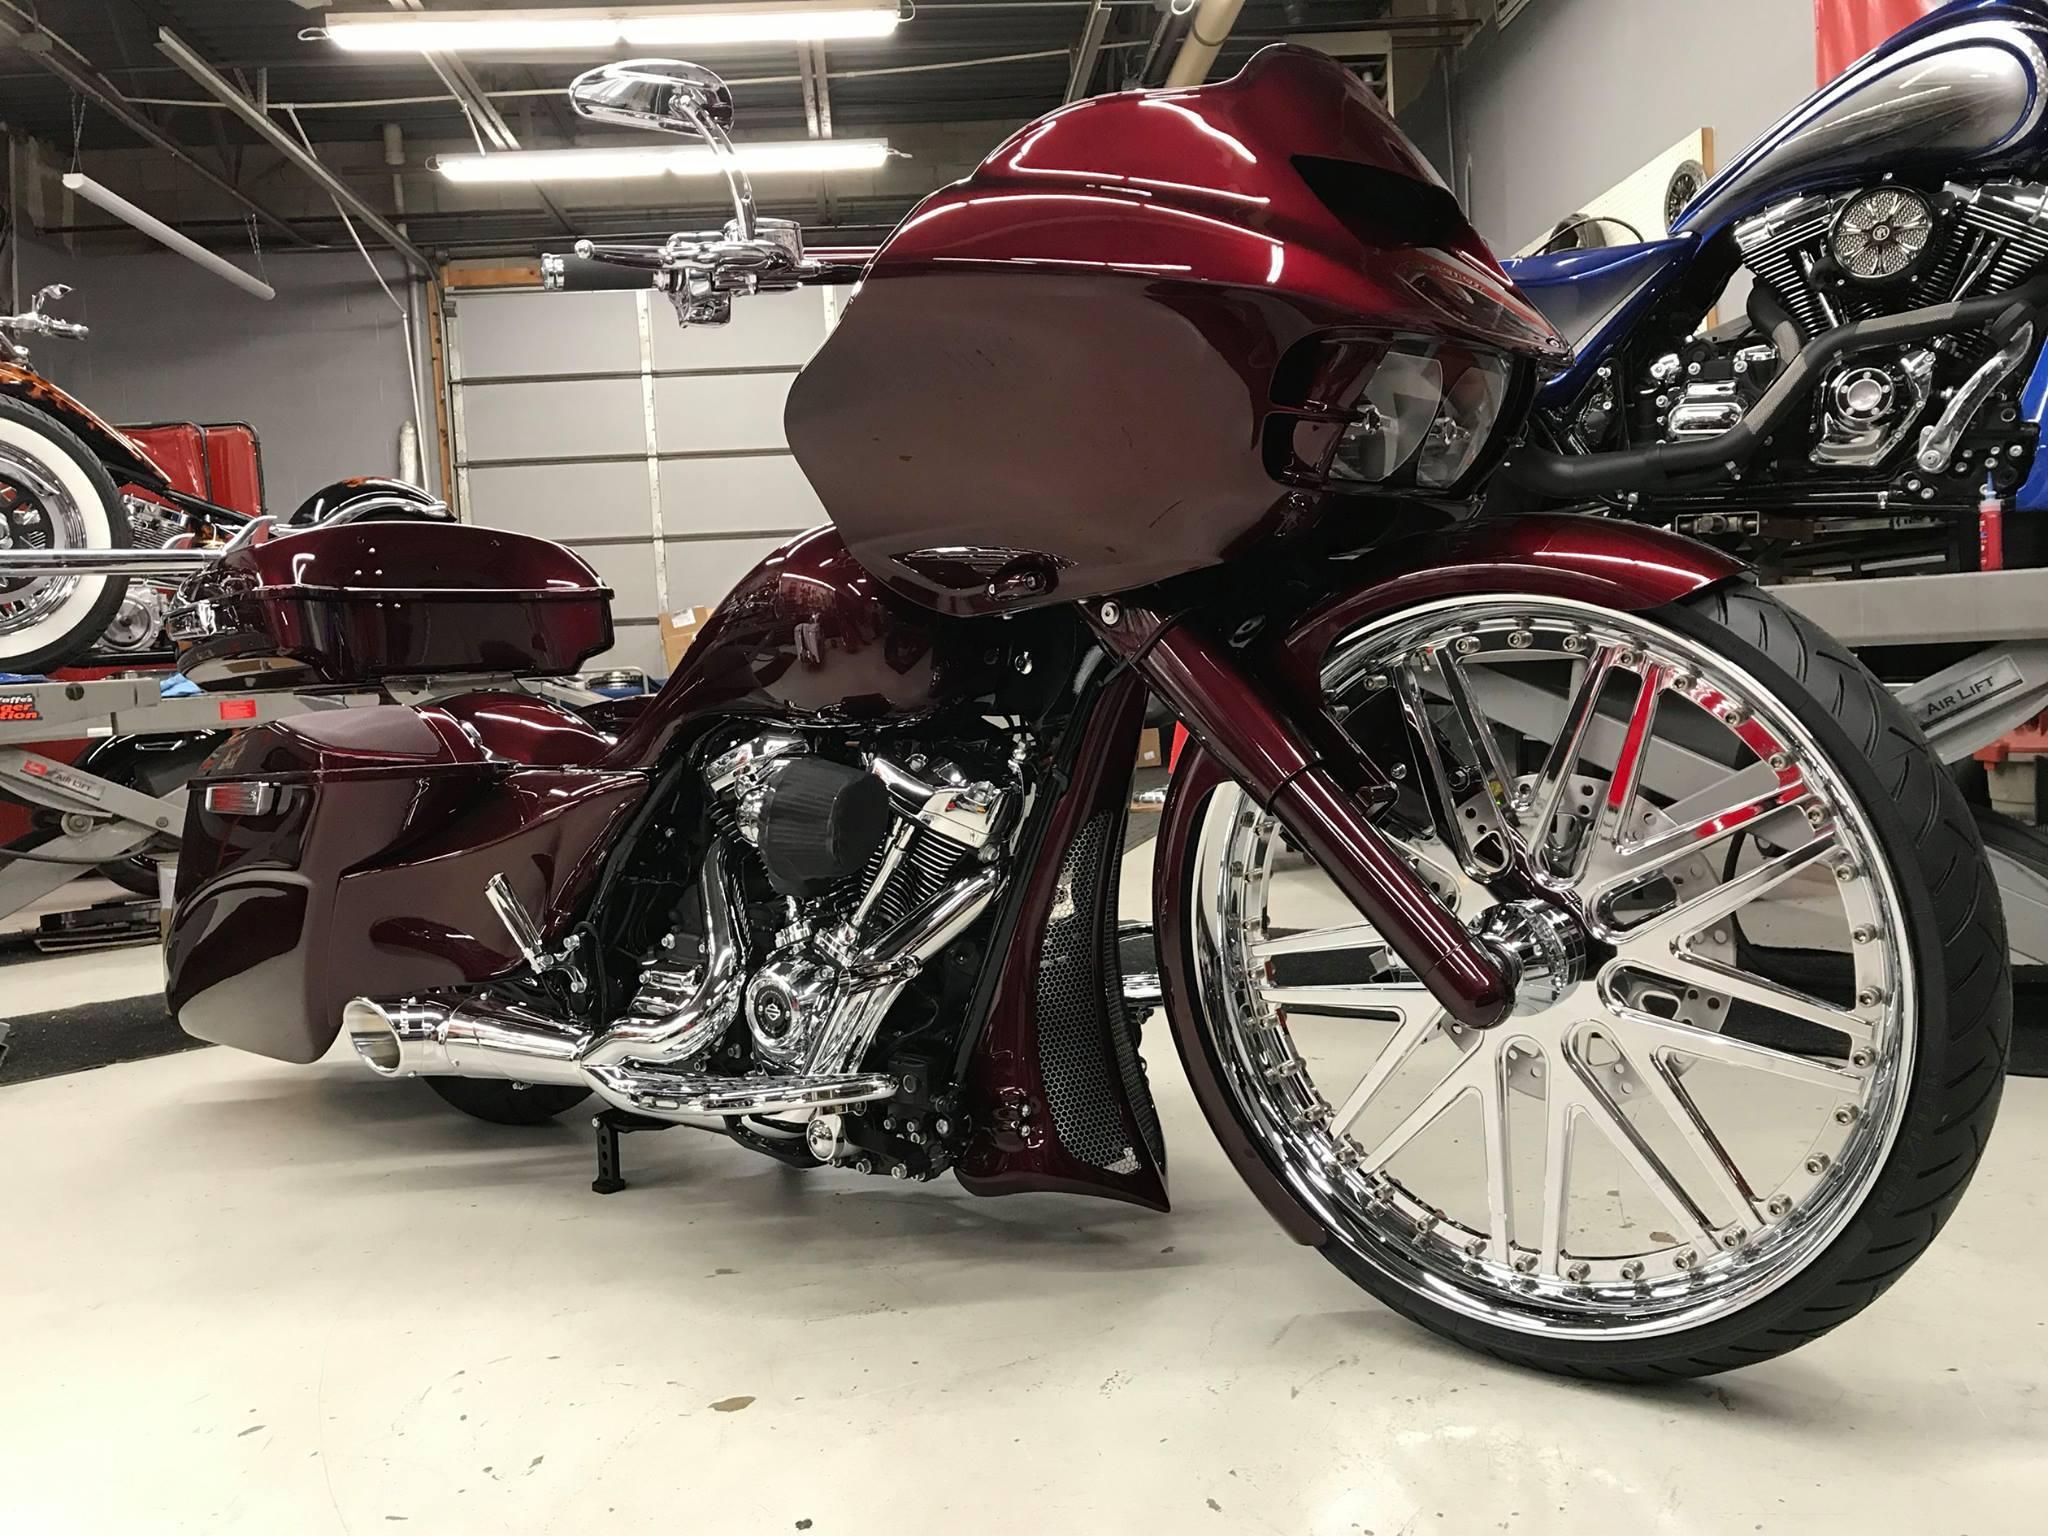 Removing Harley Touring Forks